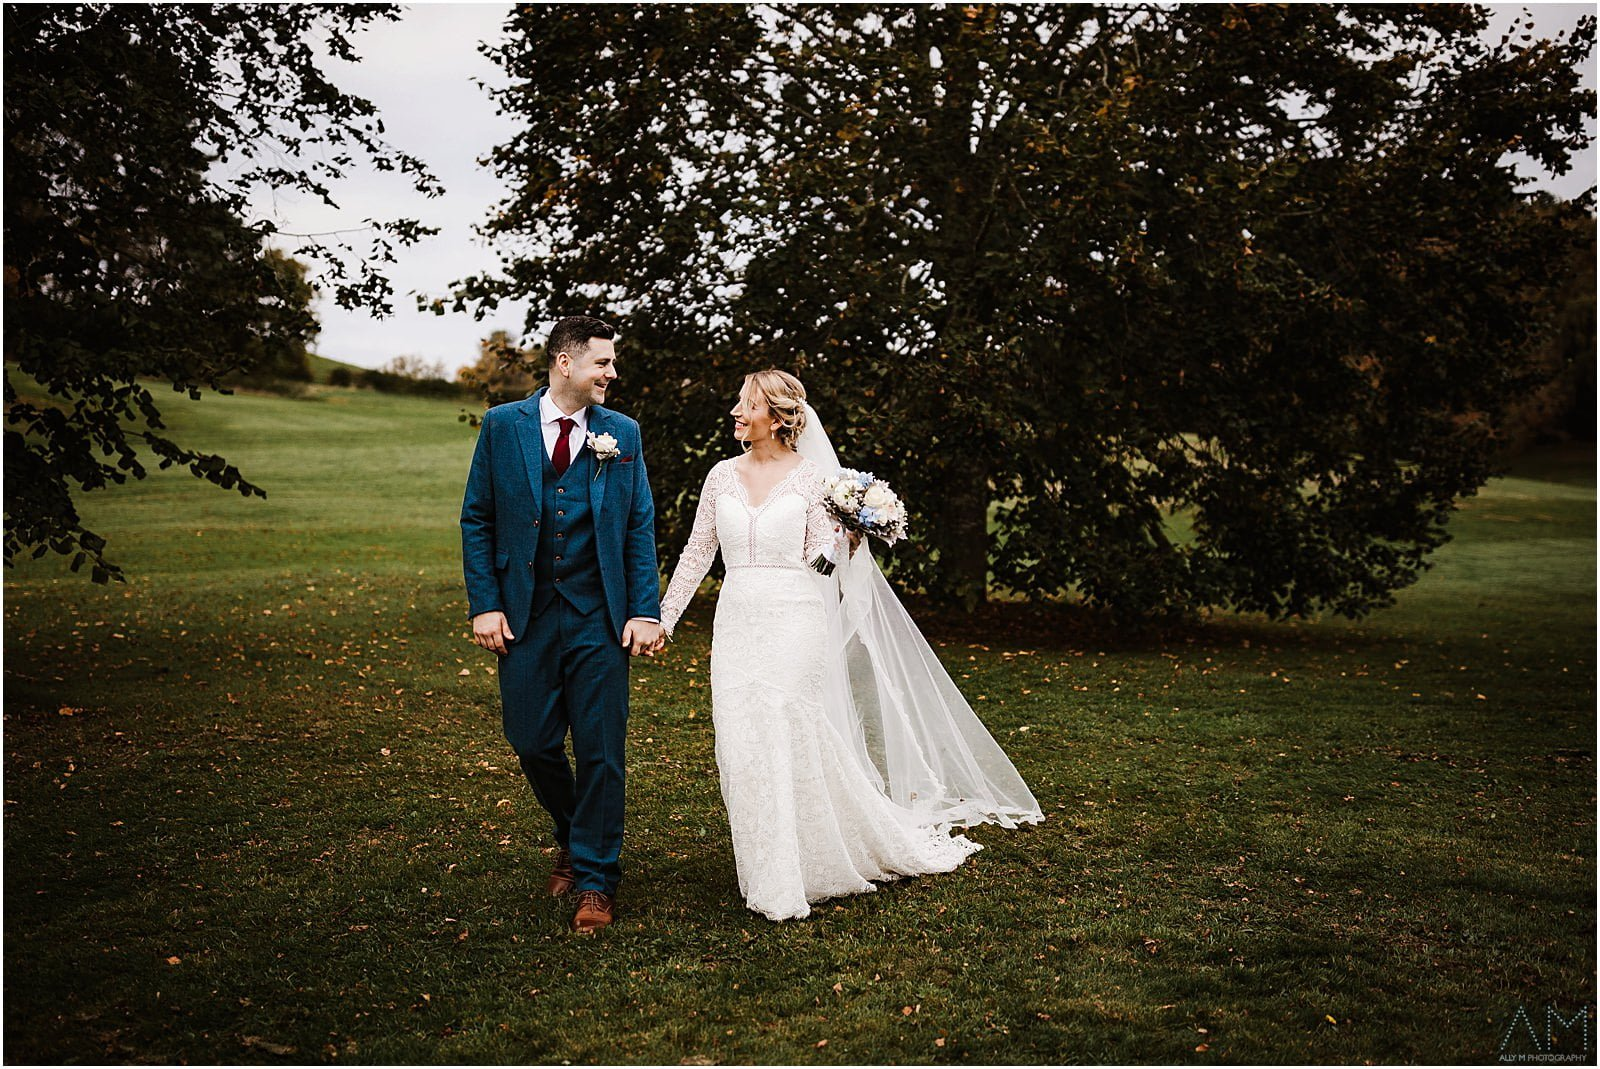 Bride and groom walking togther at Delamere Manor